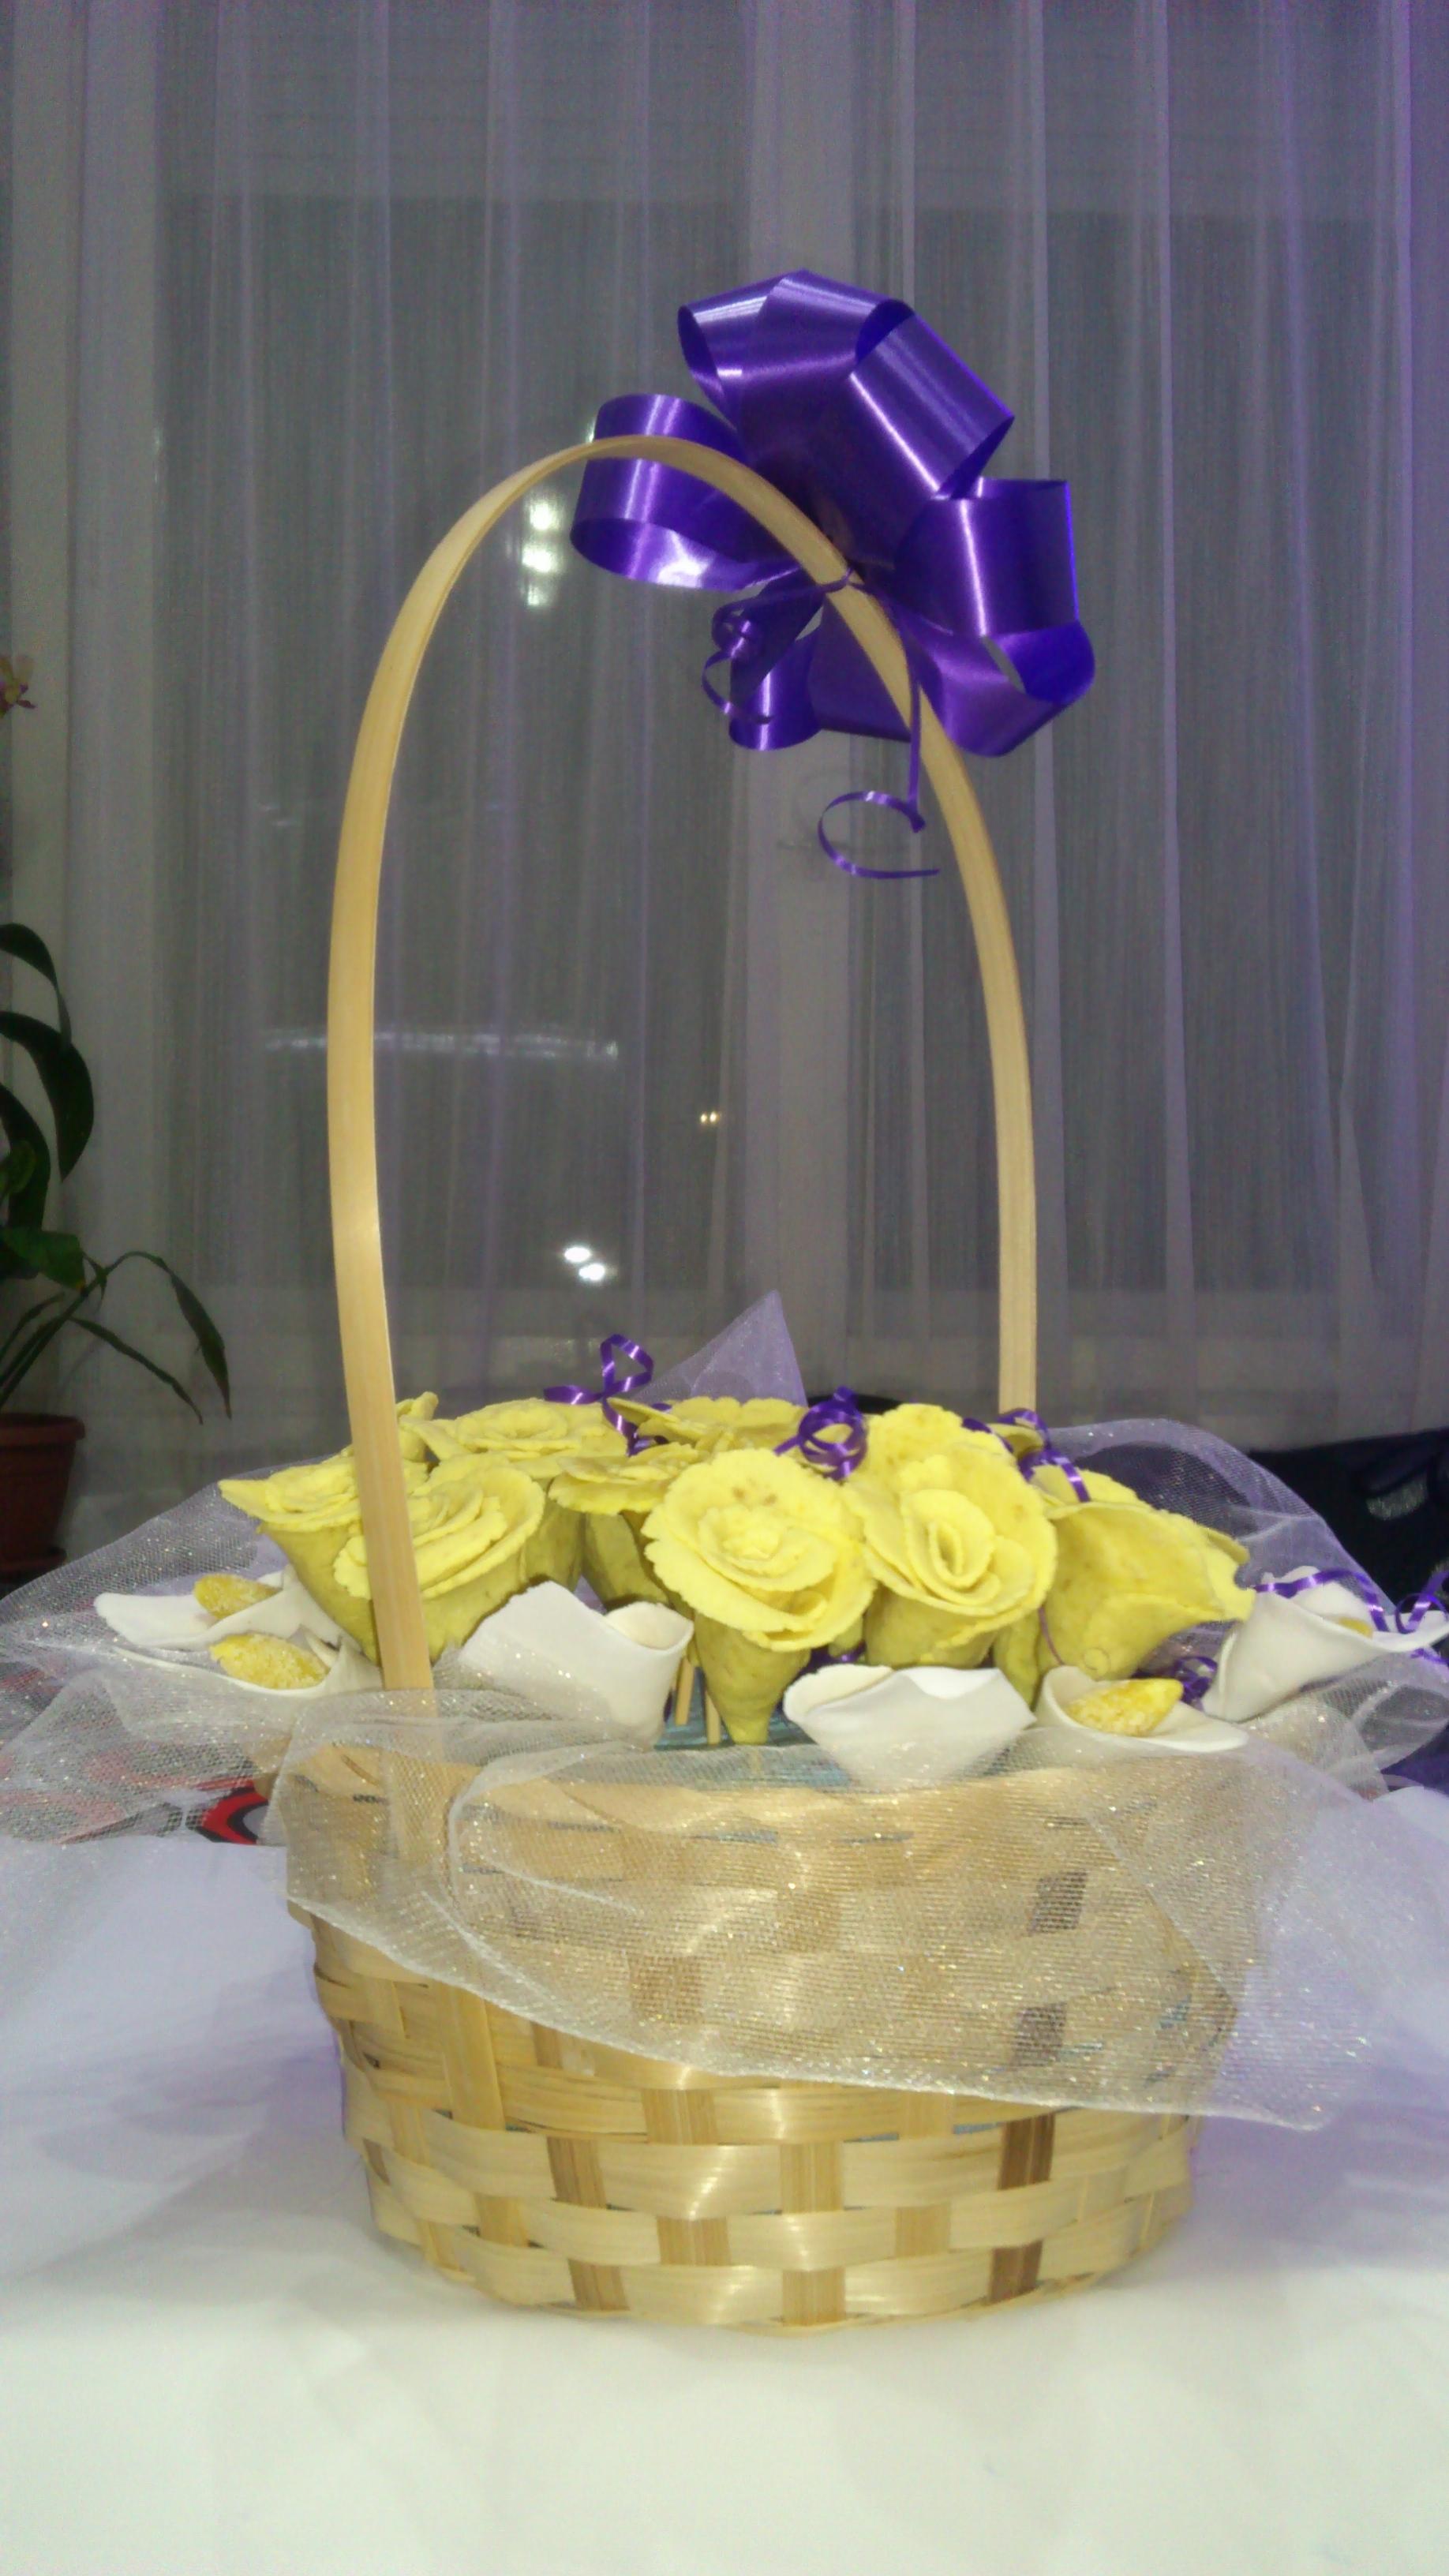 Sweet fondant bouquet